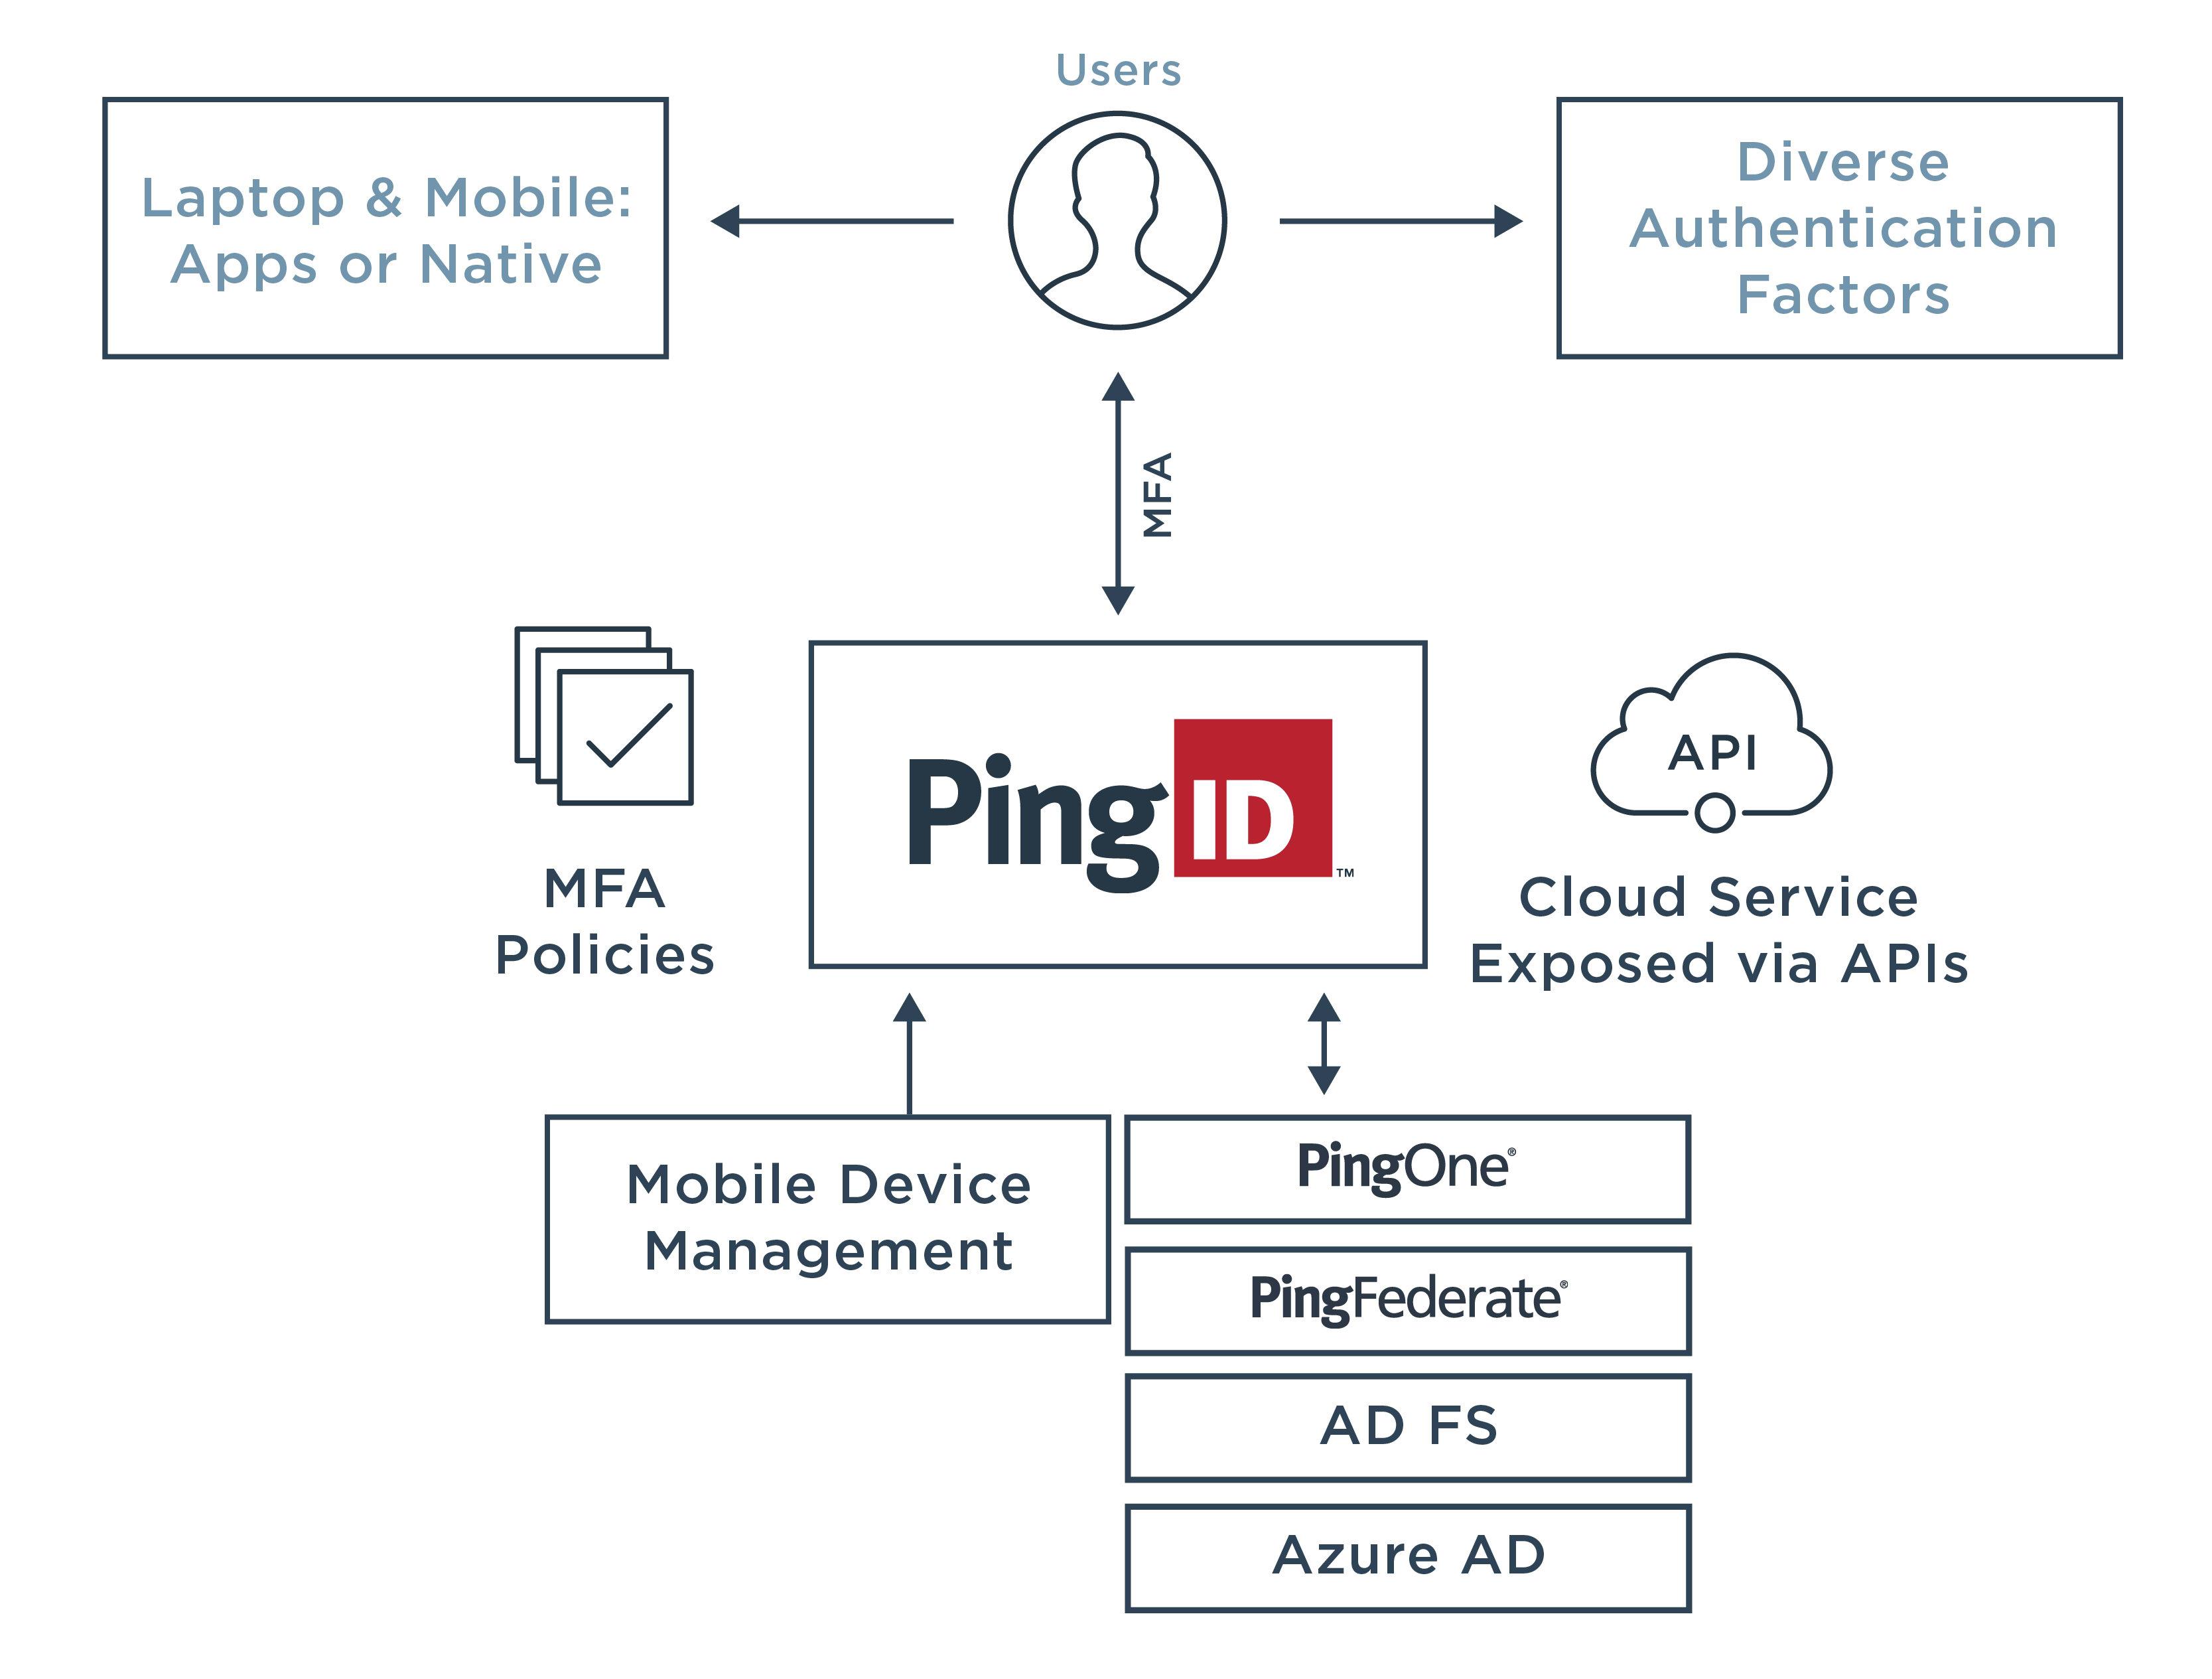 Diagram illustrating PingID methods